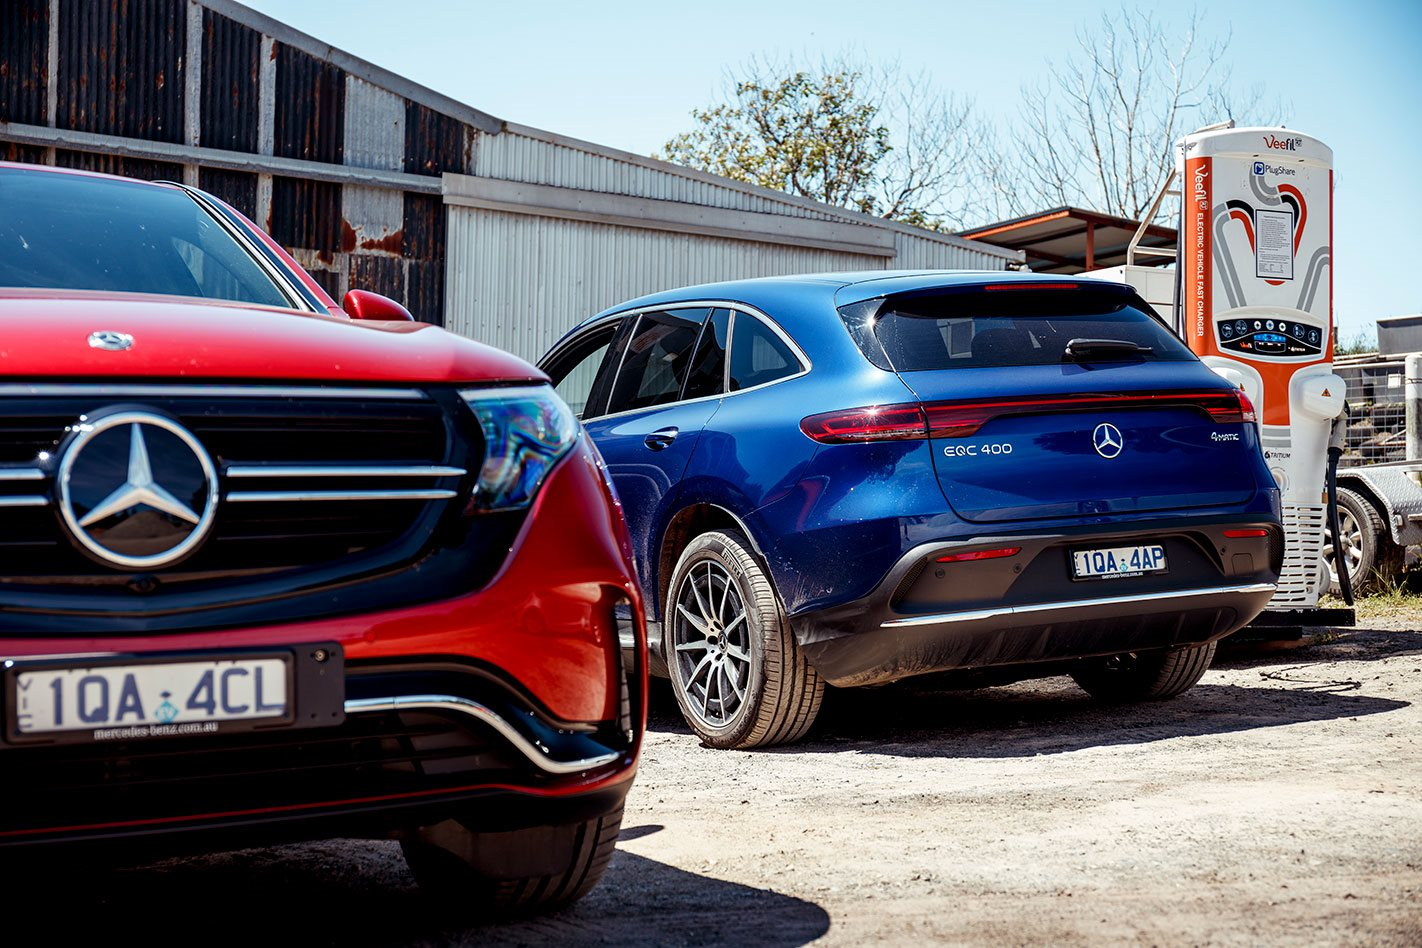 Meet the COTY 2020 finalists: Mercedes-Benz EQC